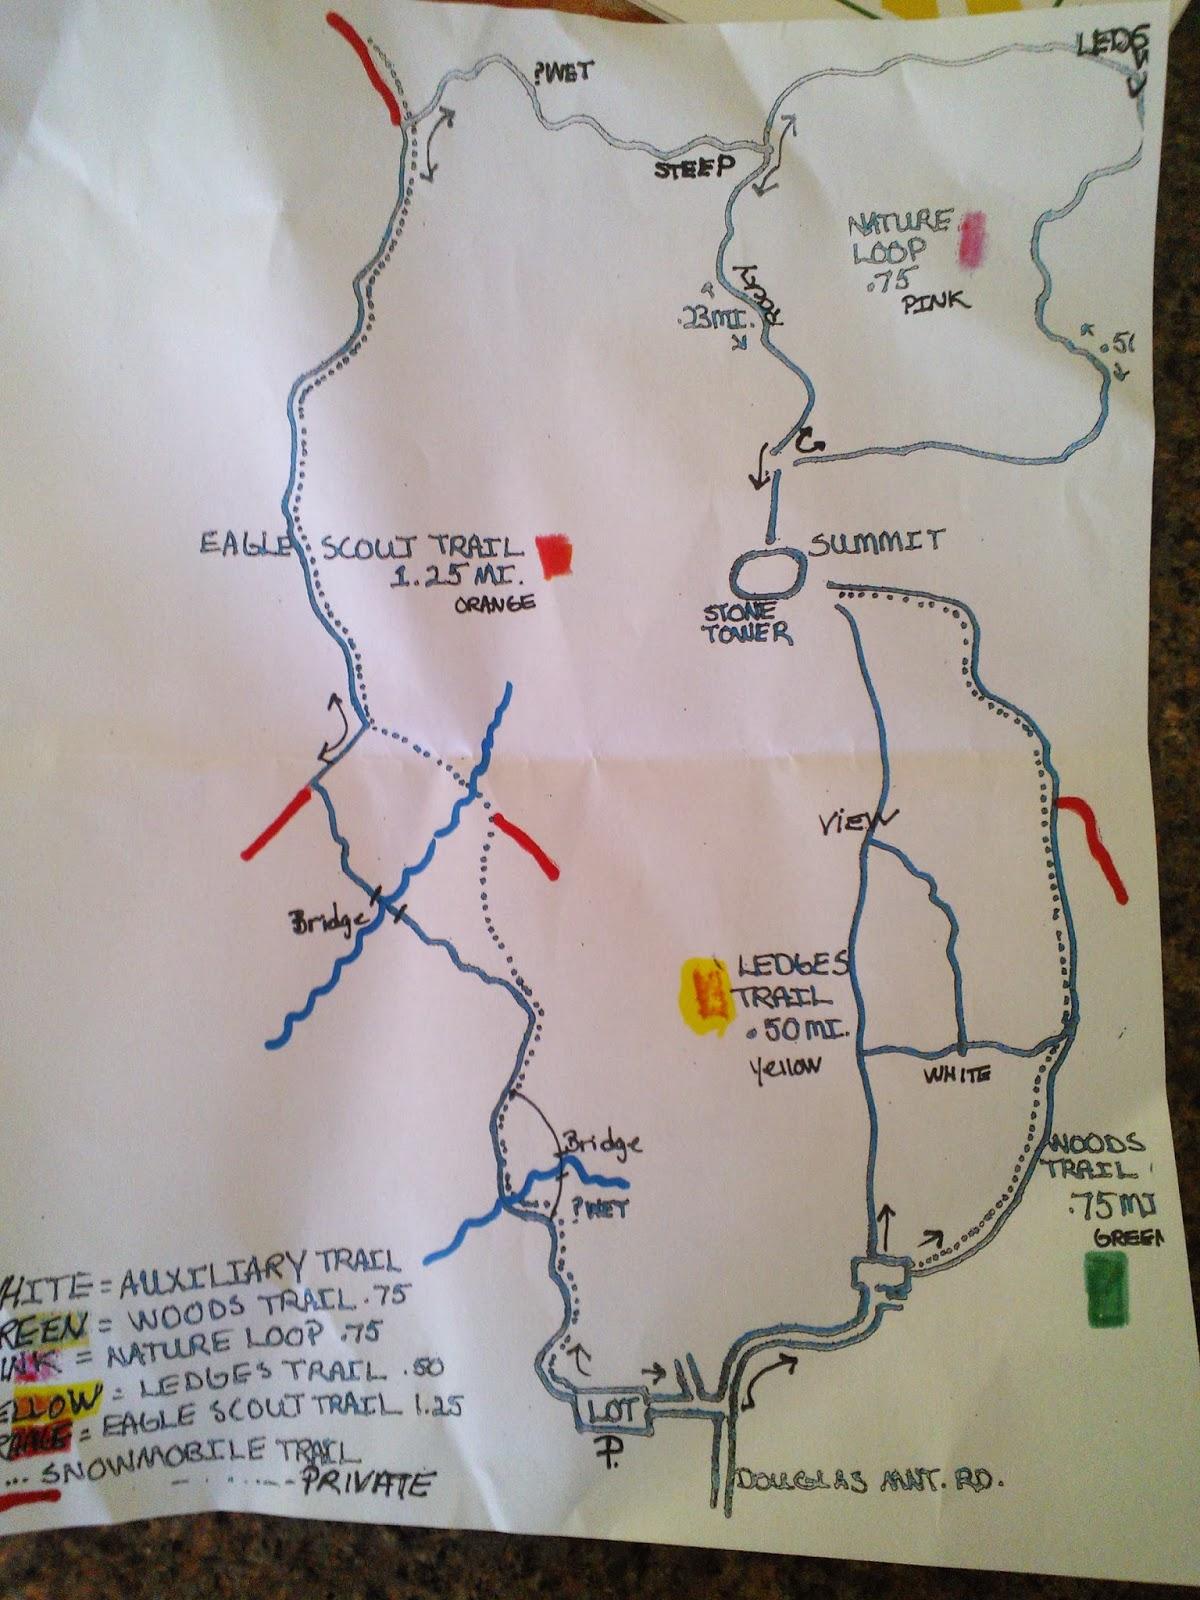 Adventures with renee douglas mountain baldwinsebago maine douglas mountain trail map publicscrutiny Images